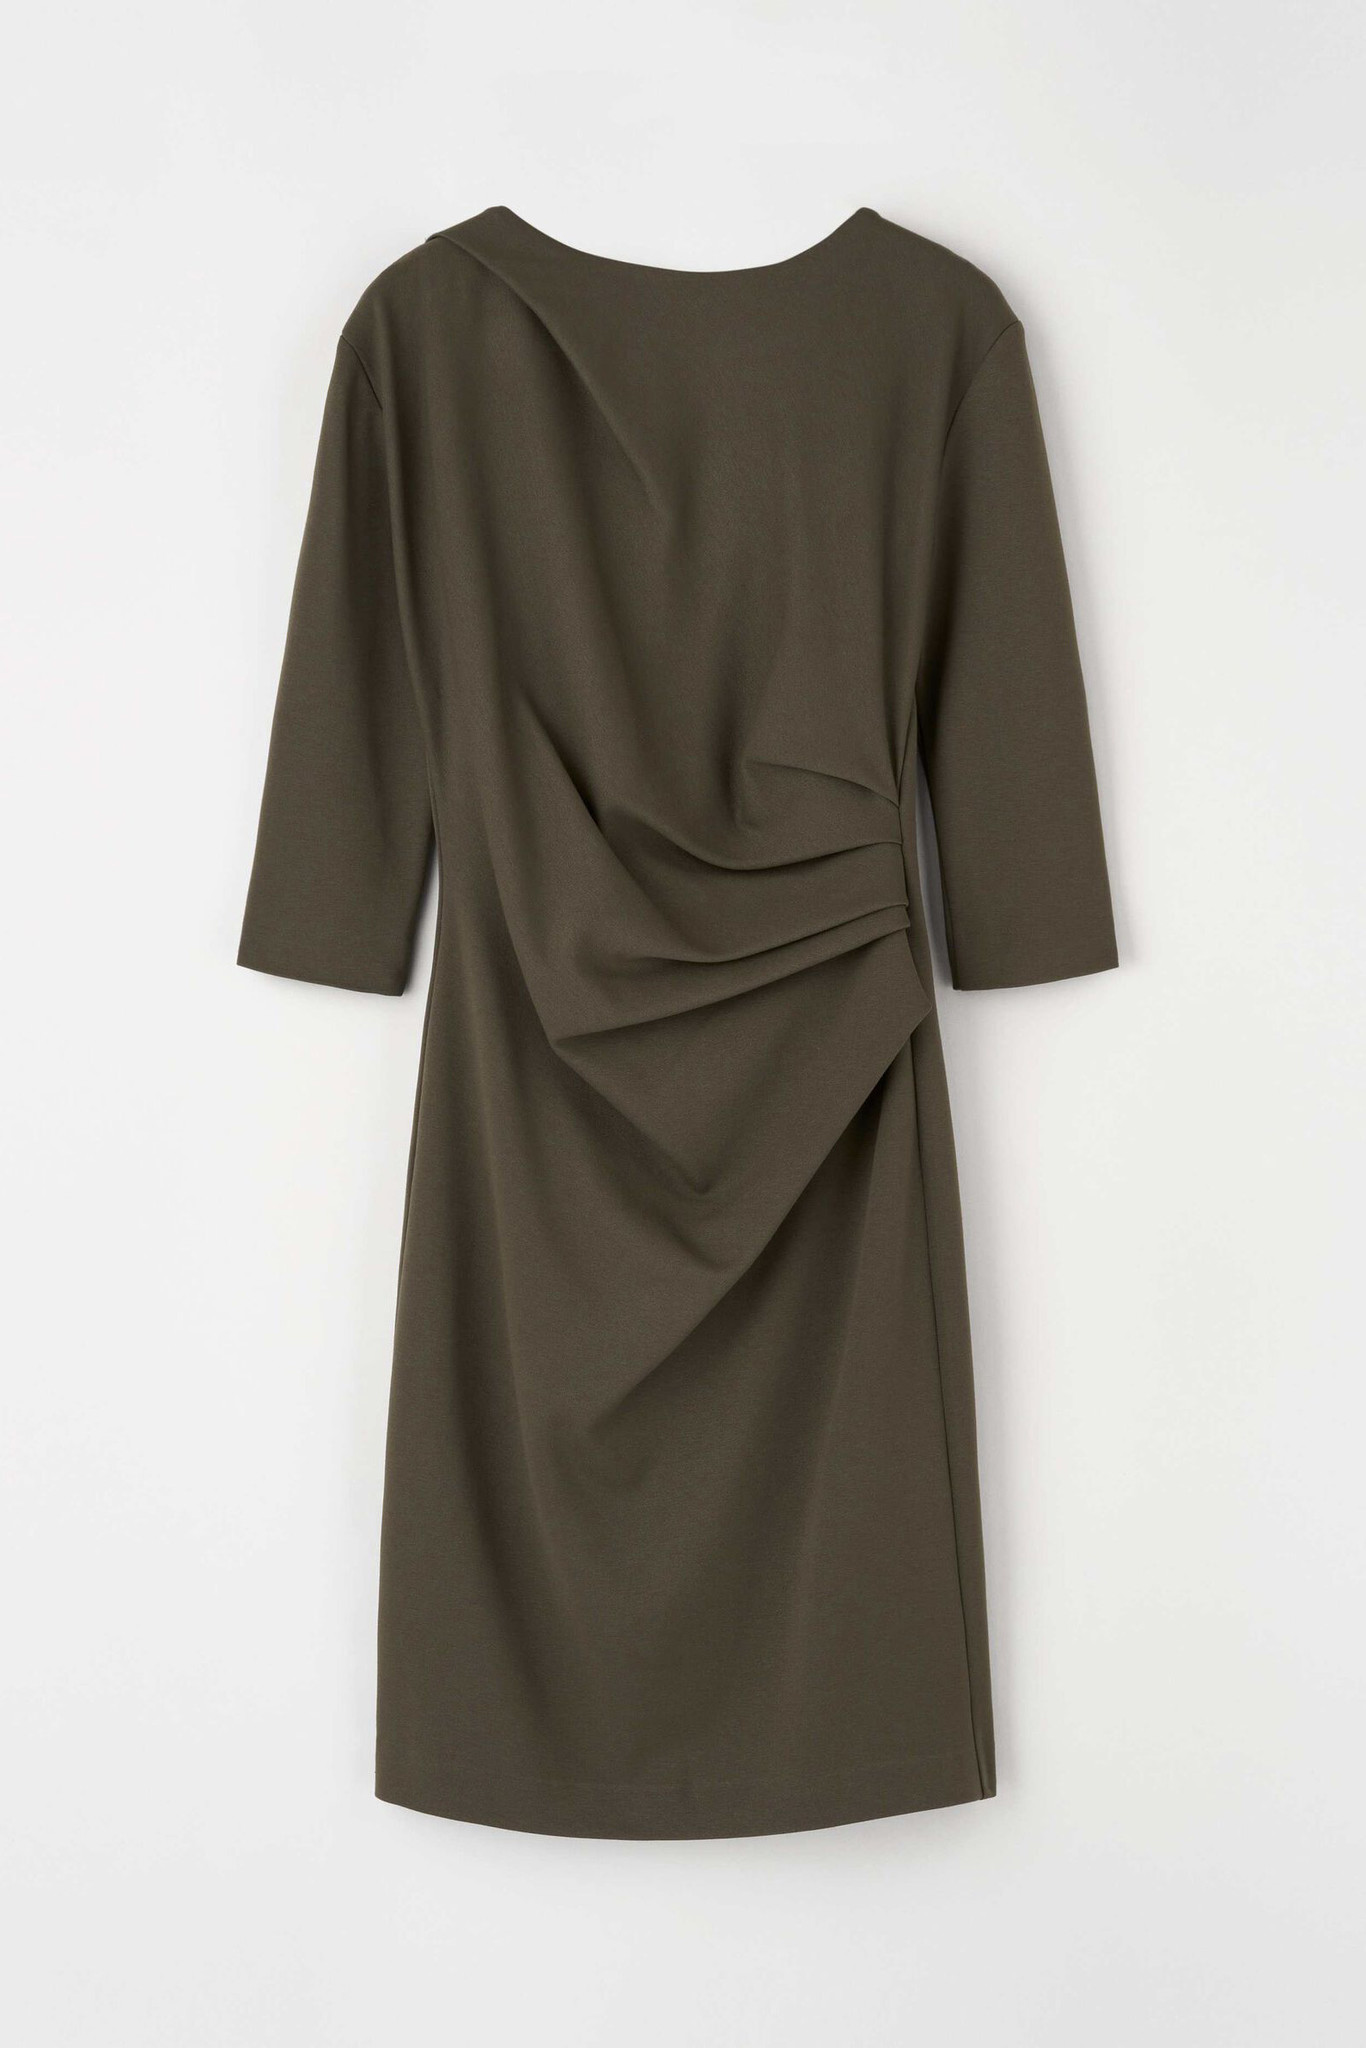 Izza S Dress - Kalamata-6